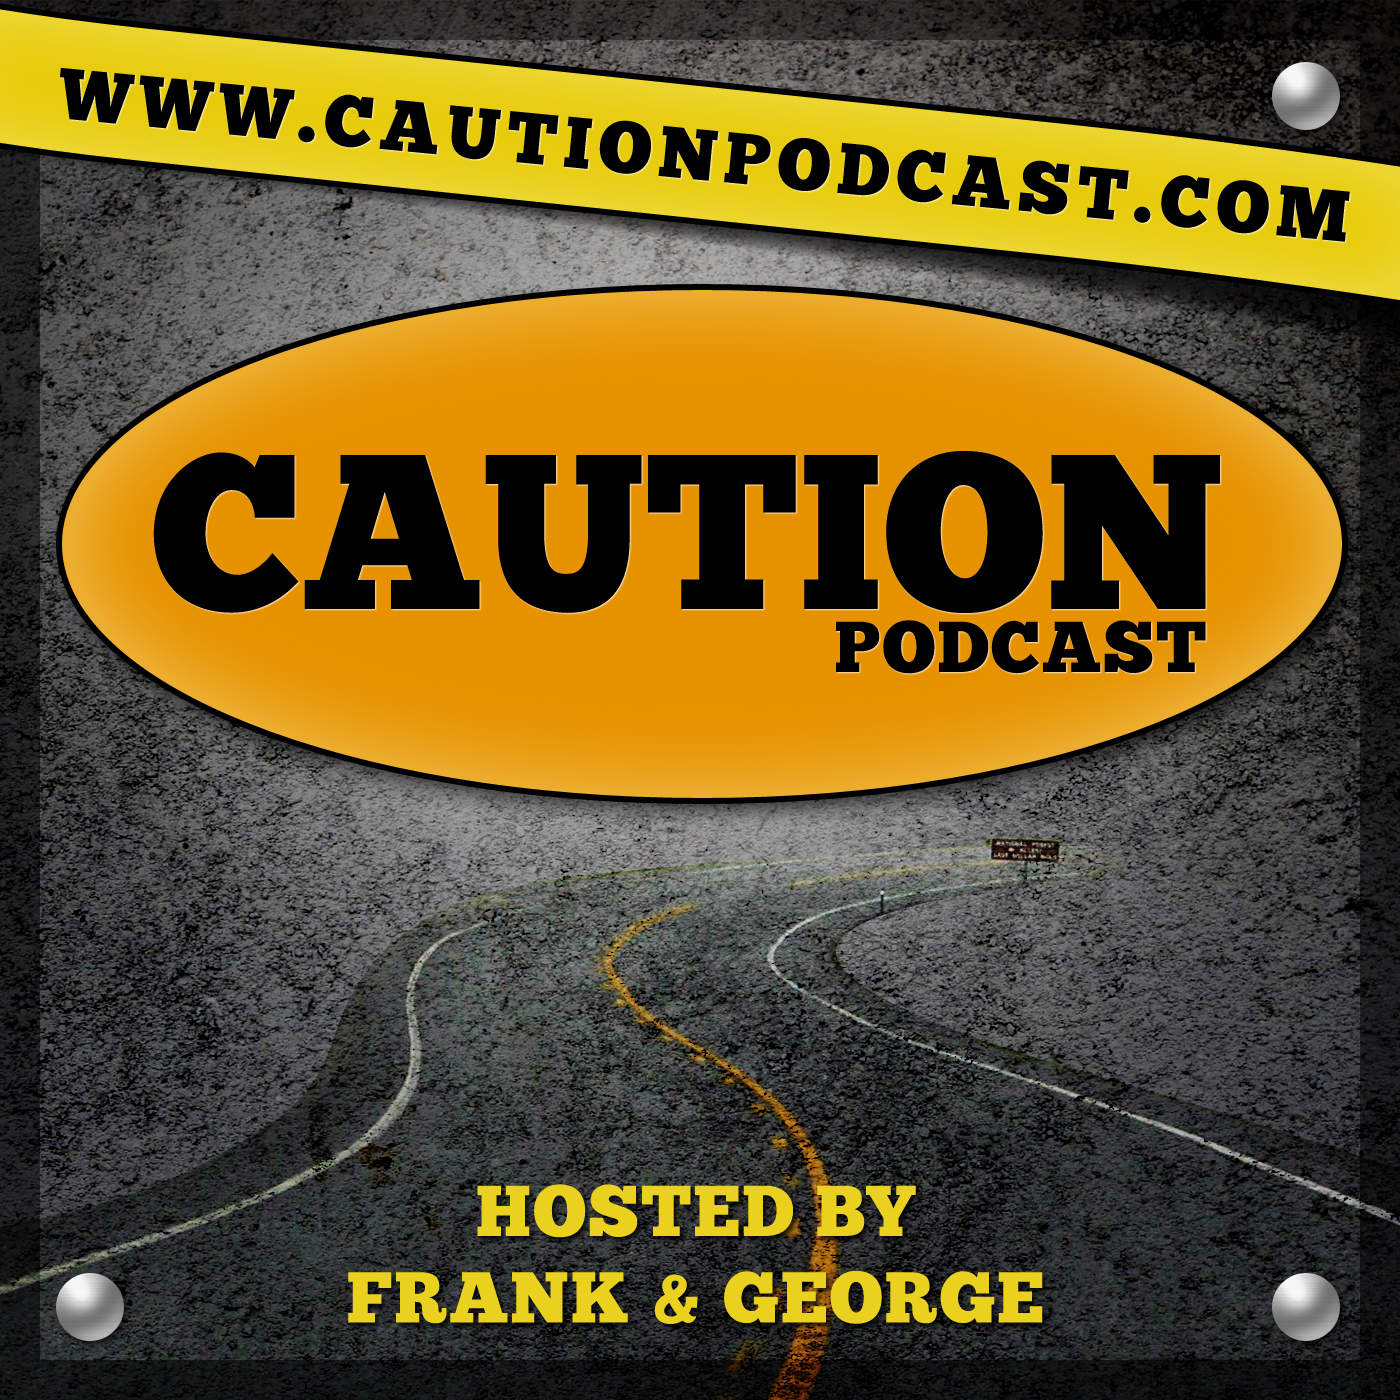 Caution Podcast